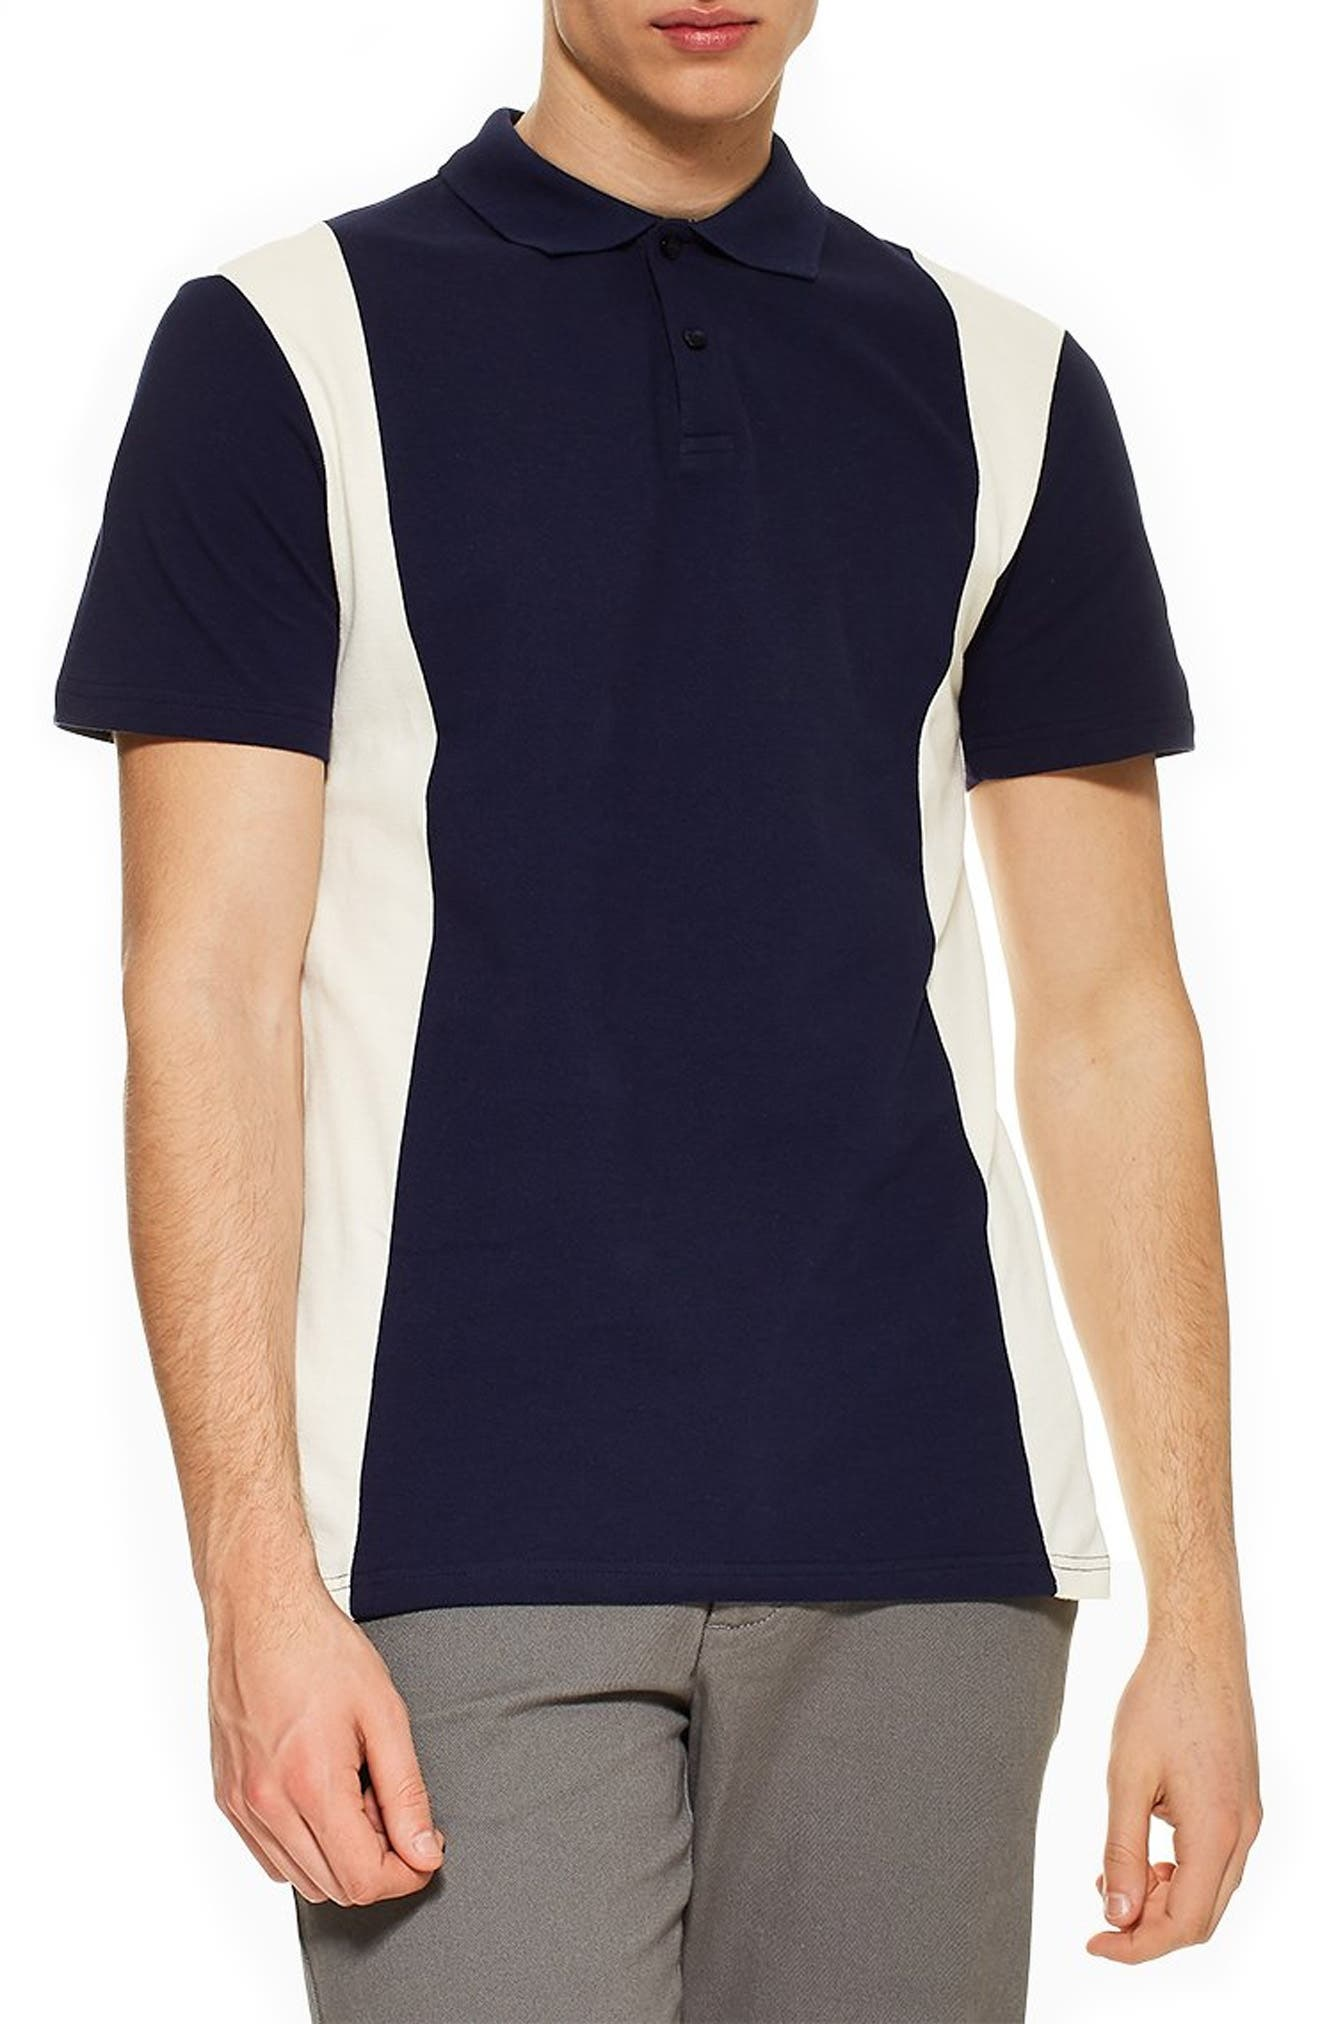 1960s – 70s Mens Shirts- Disco Shirts, Hippie Shirts Mens Topman Colorblock Polo Size X-Small - Blue $40.00 AT vintagedancer.com